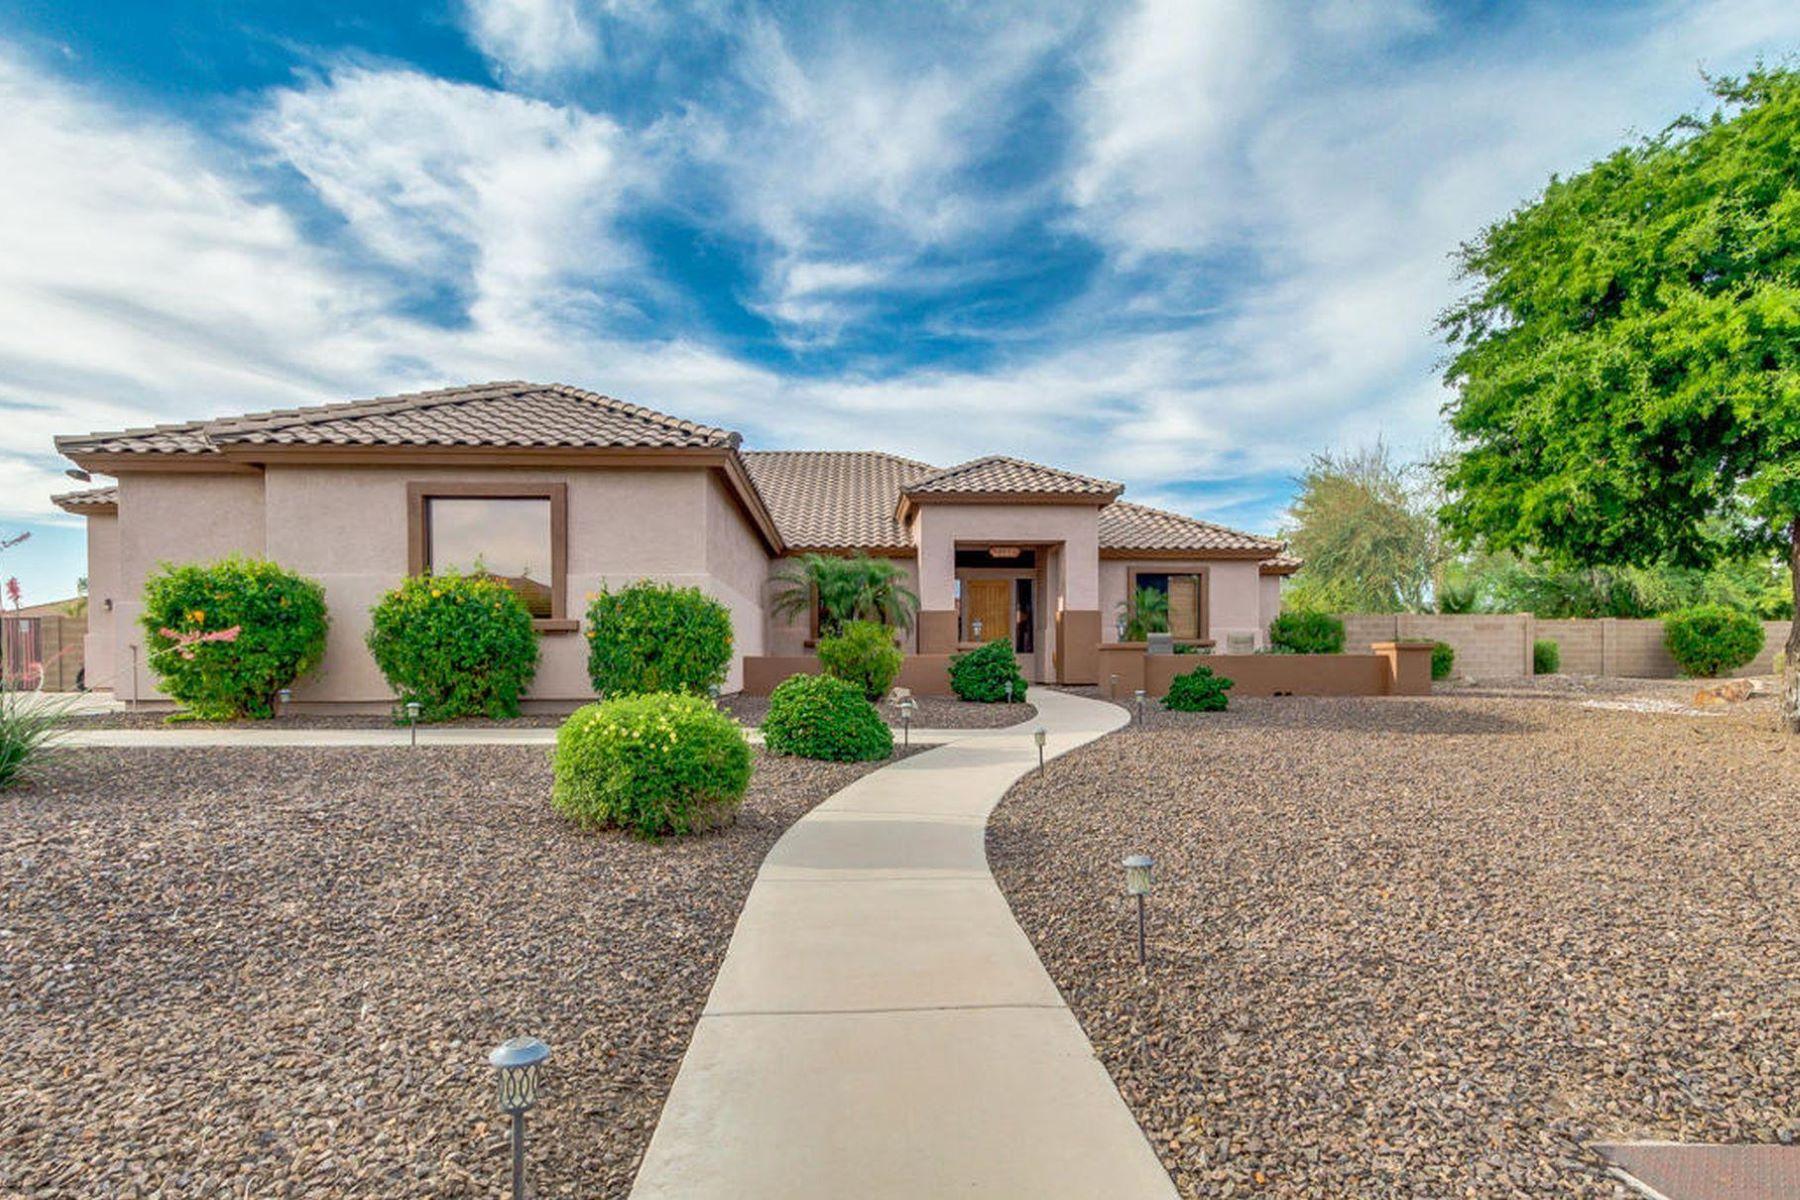 Single Family Homes για την Πώληση στο 7156 East Granada Street, Mesa, AZ 85207 Mesa, Αριζονα 85207 Ηνωμένες Πολιτείες